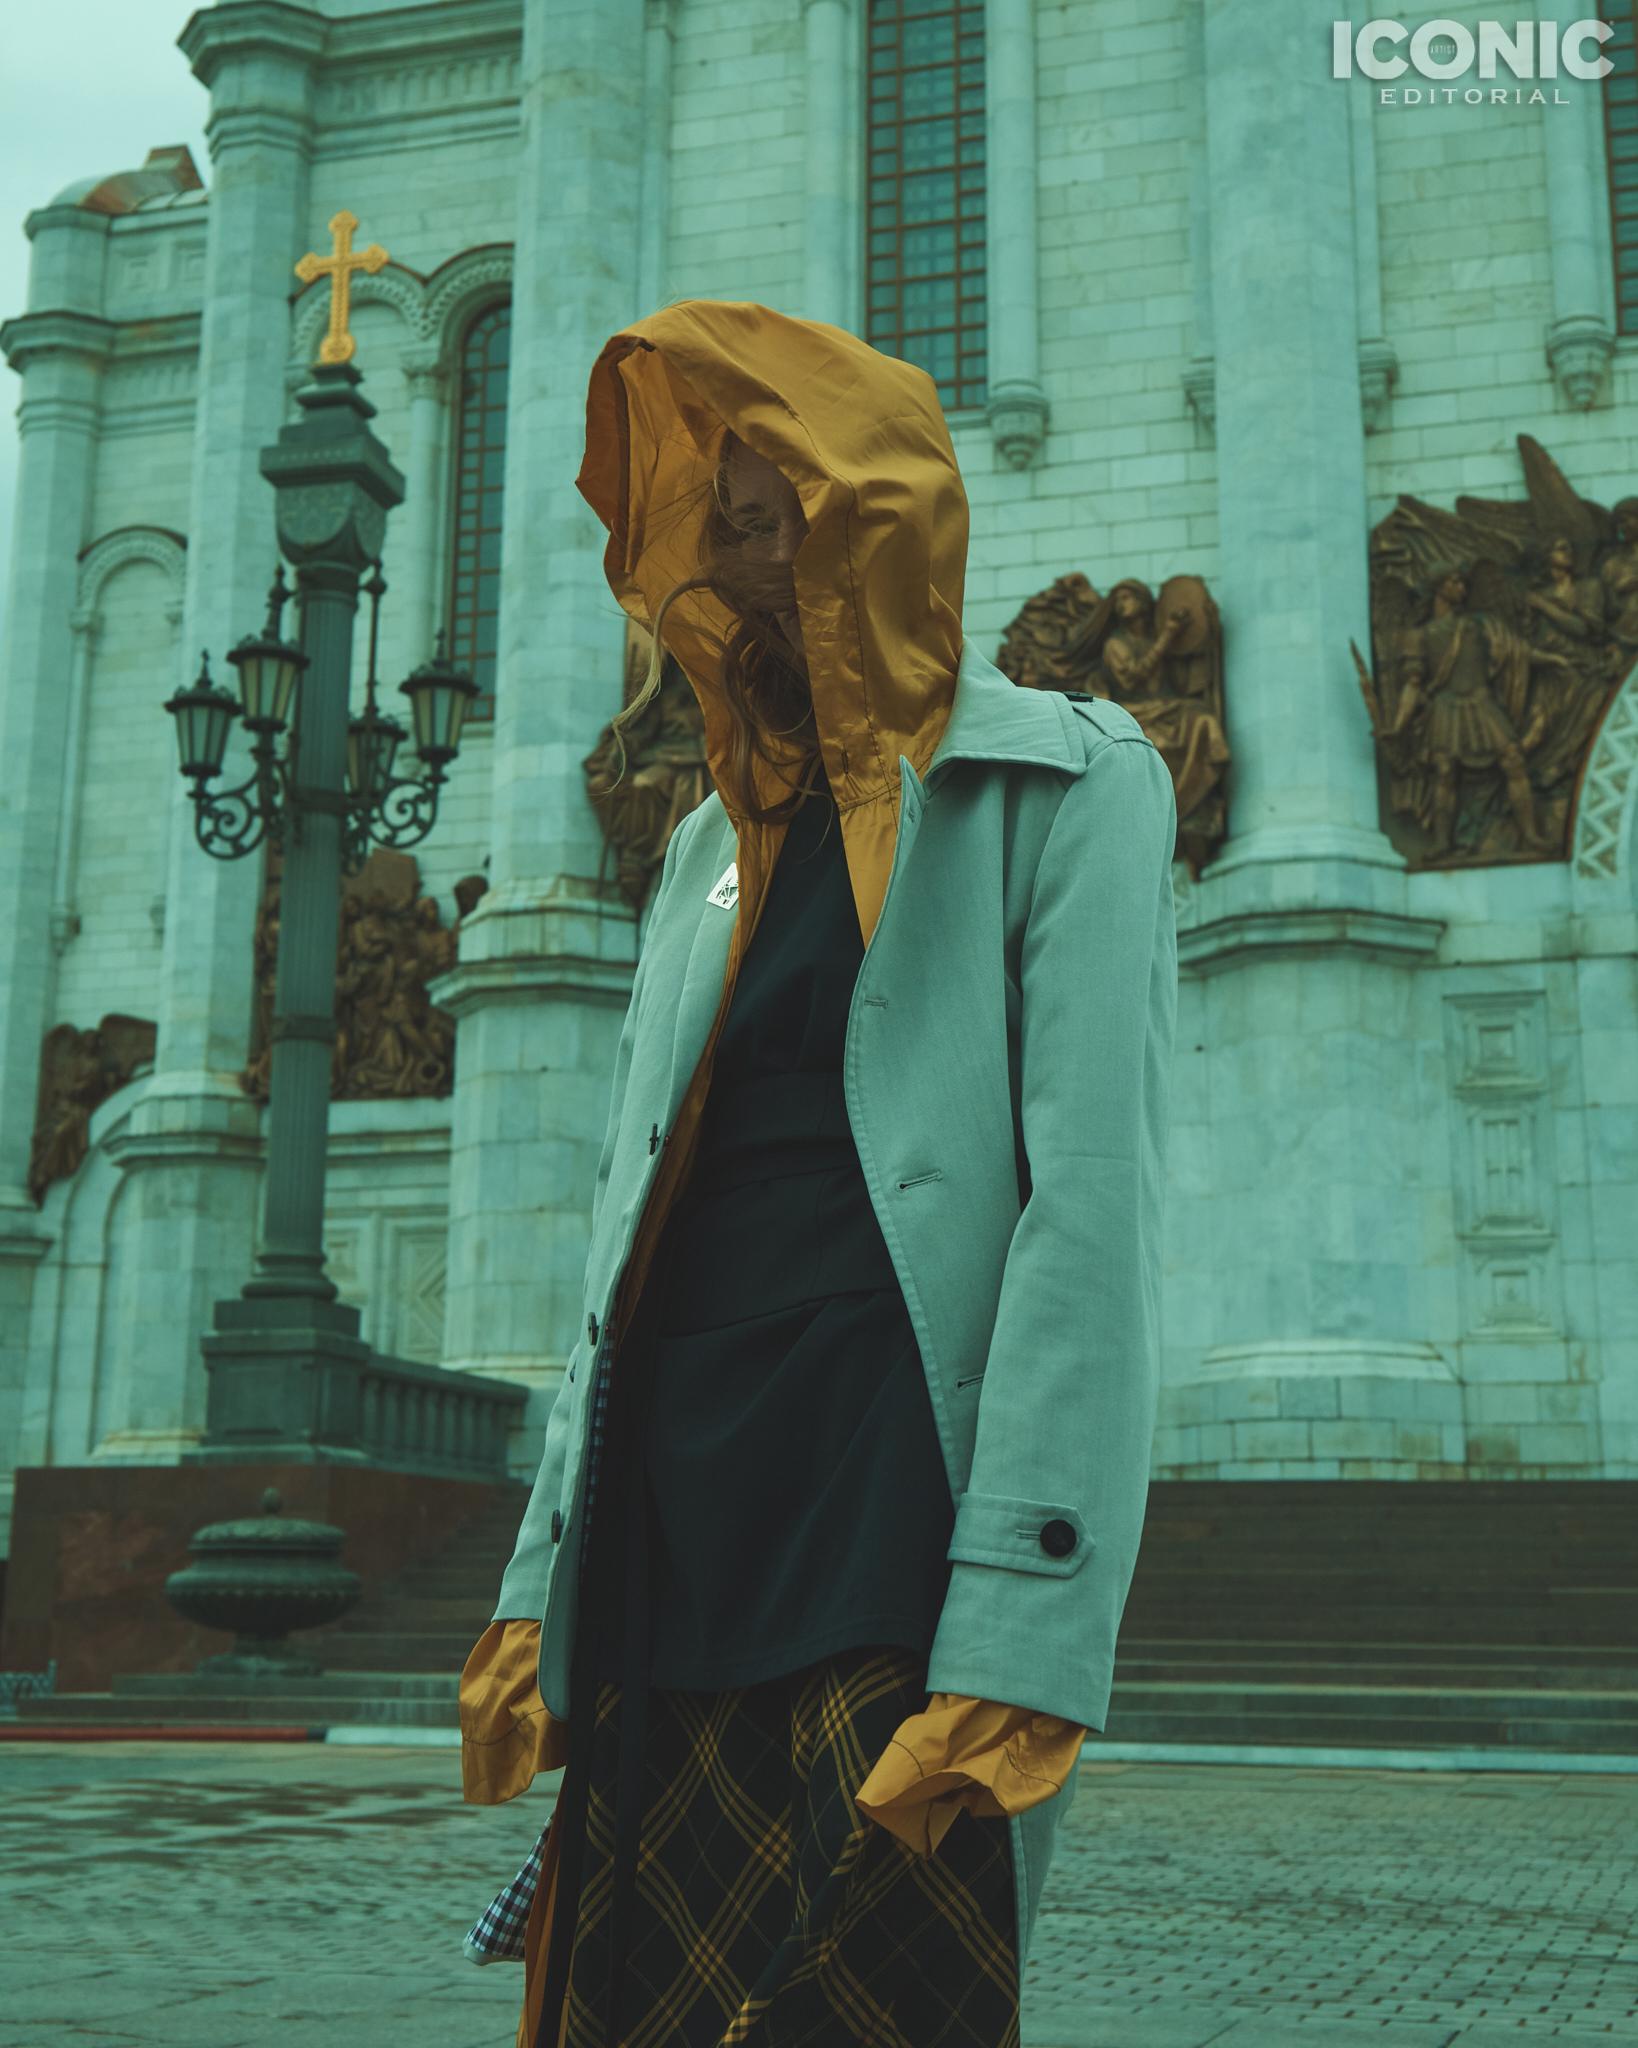 14/15  Jacket |  @artemshumov  Sweater |  @pingpongclubmoscow  Cape |  @crimescene_official  Dress |  @lenamaksimova.brand   © Alej Fernández